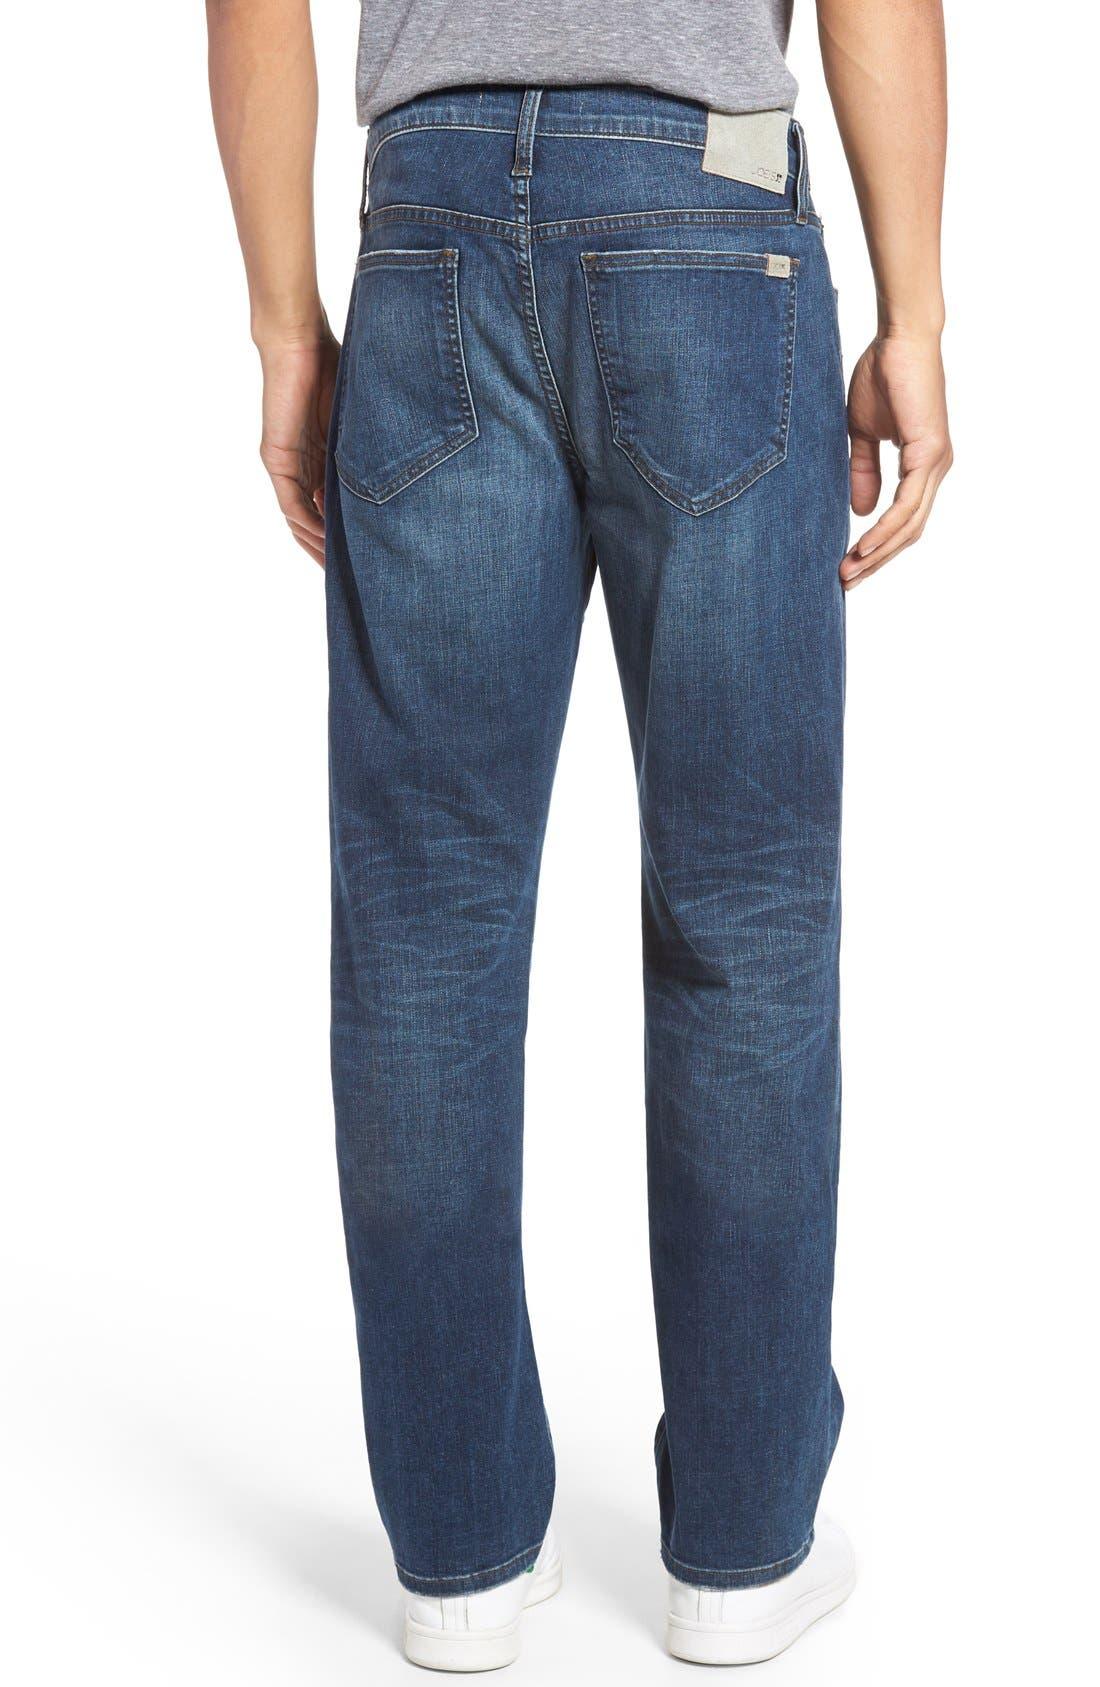 Alternate Image 2  - Joe's Brixton Slim Fit Jeans (Gladwin)